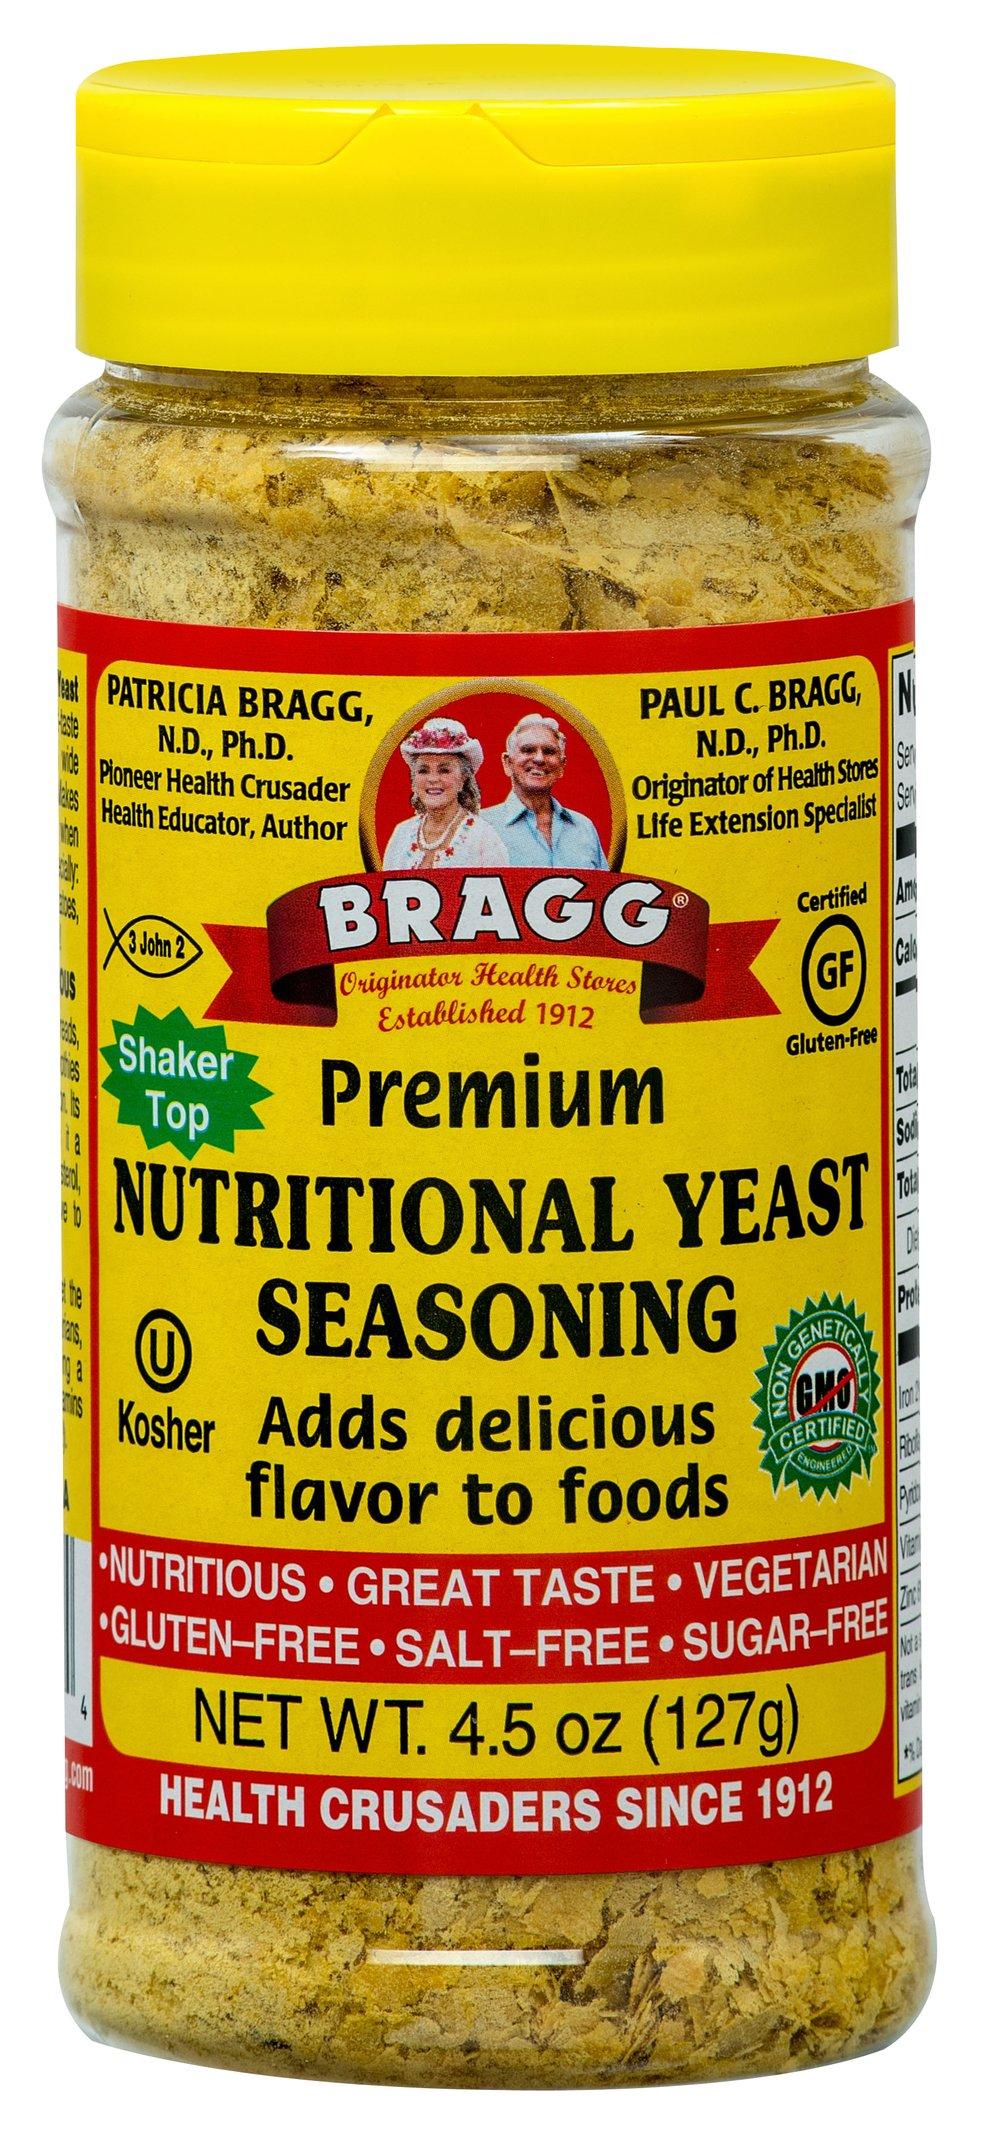 Bragg Premium Nutritional Yeast Seasoning-4.5 oz Seasoning